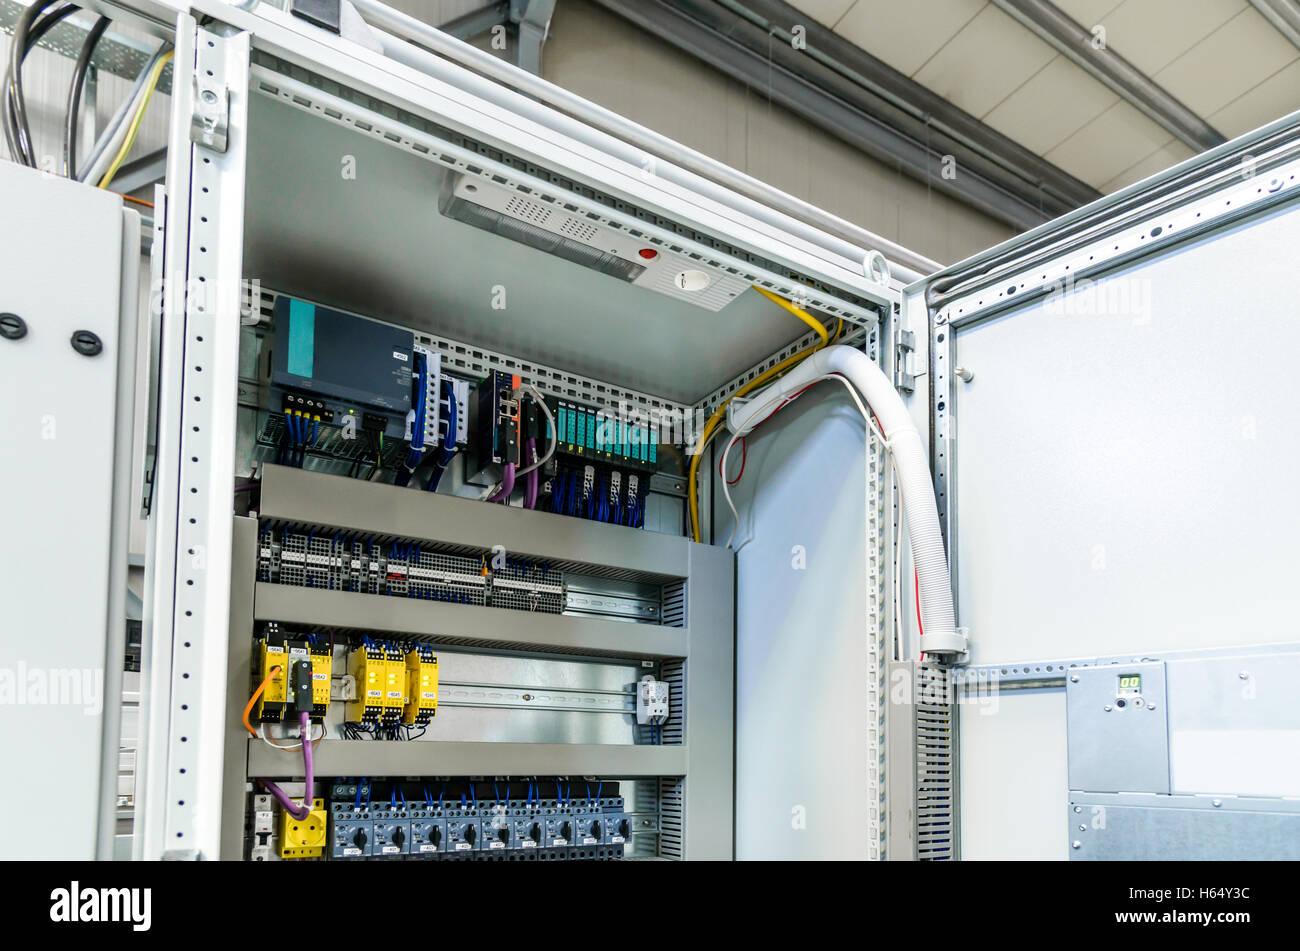 Power Distribution Box Stockfotos & Power Distribution Box Bilder ...